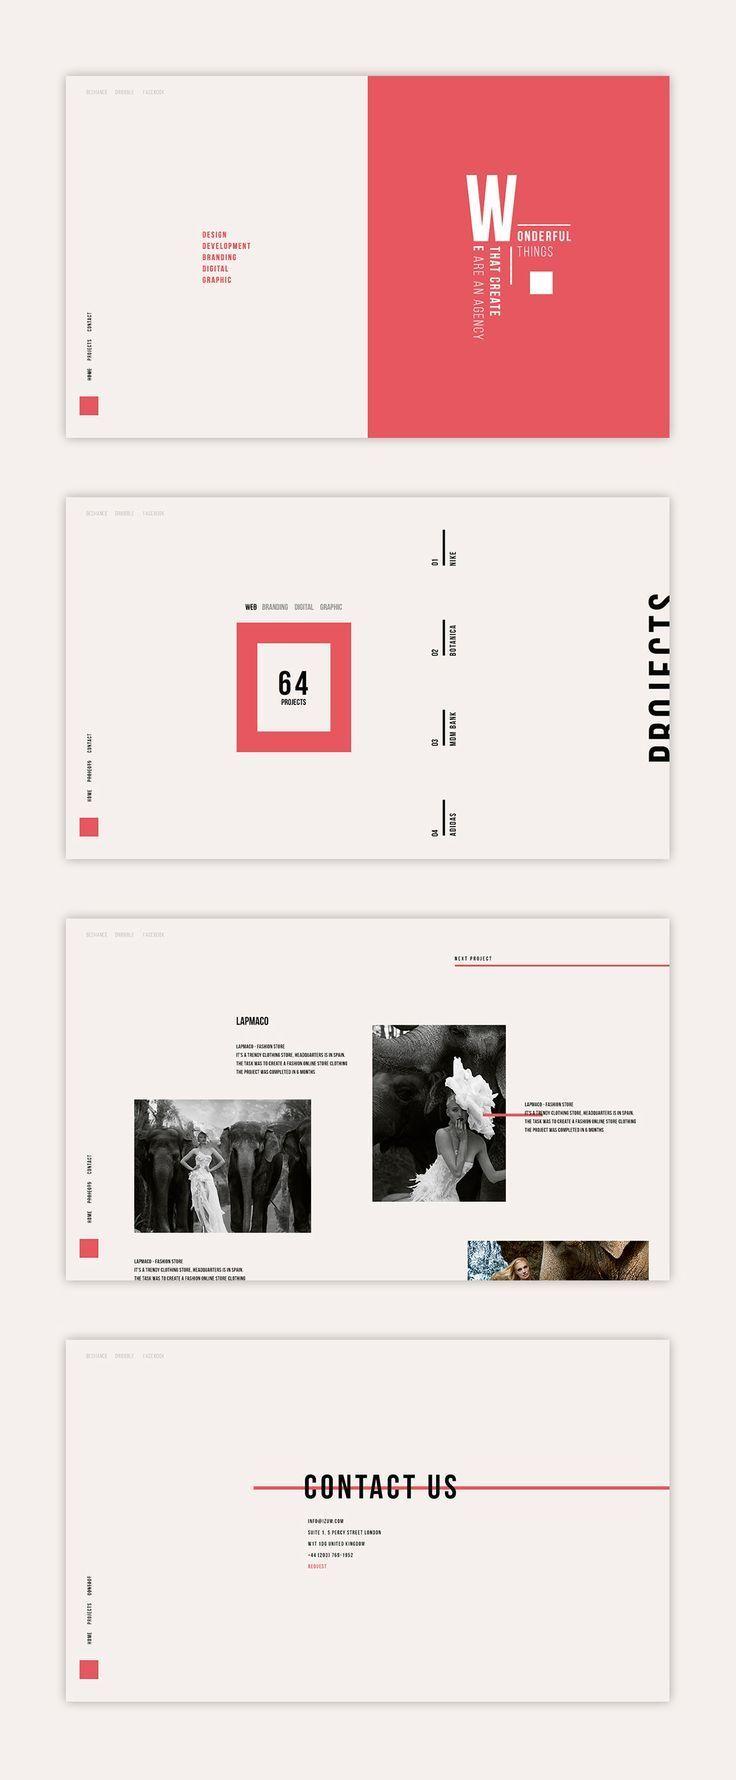 Simple Ppt Design Inspiration Graphic Design Ideas Pinterest